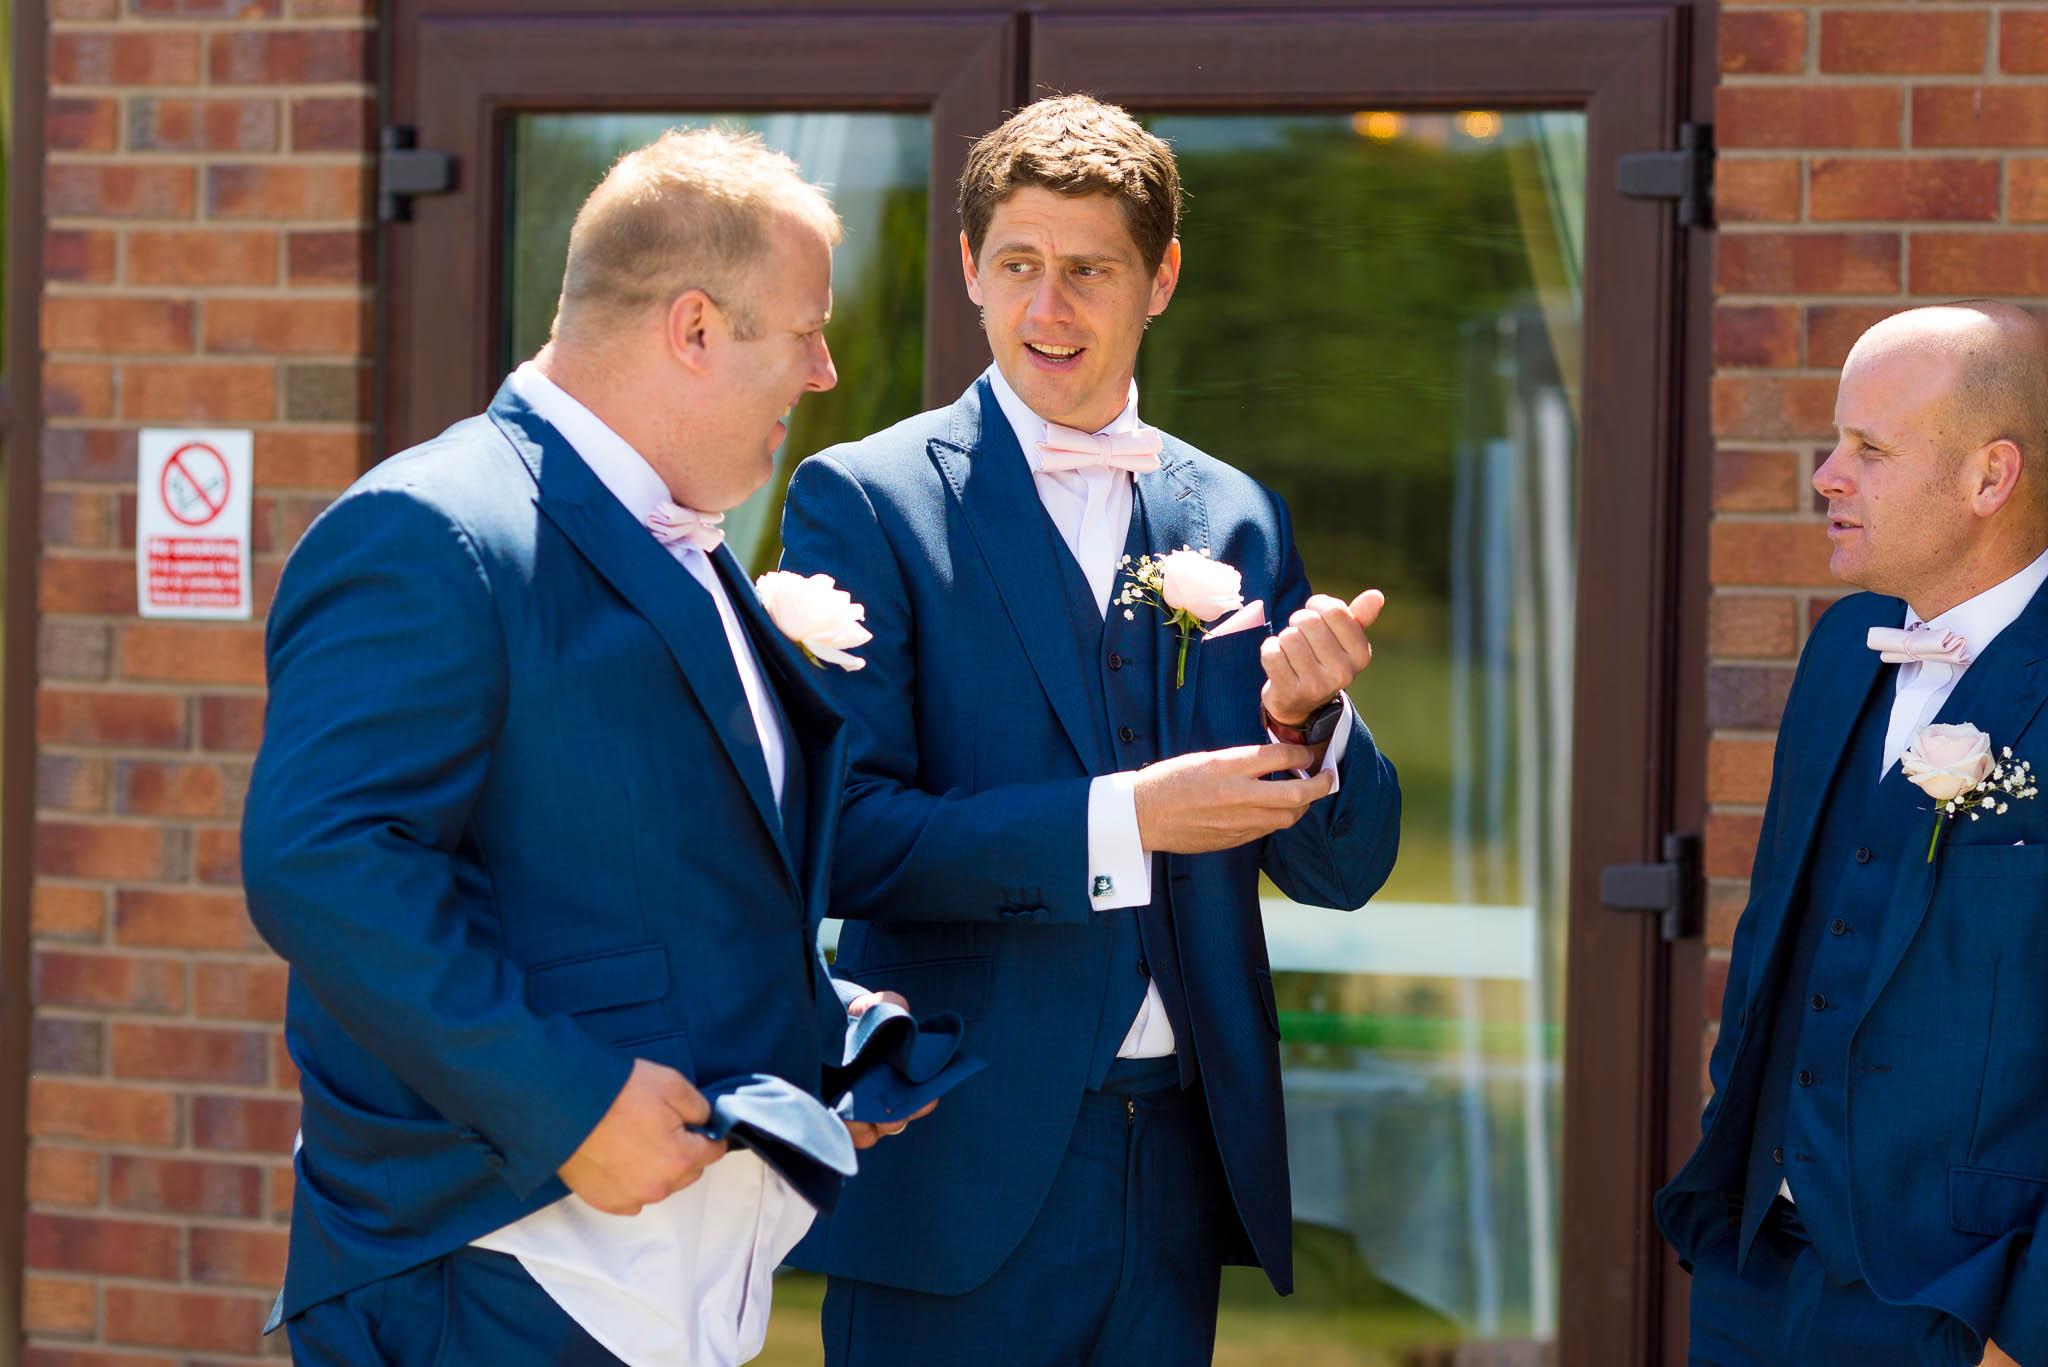 Darrington Golf Club Wedding Photographer43.jpg